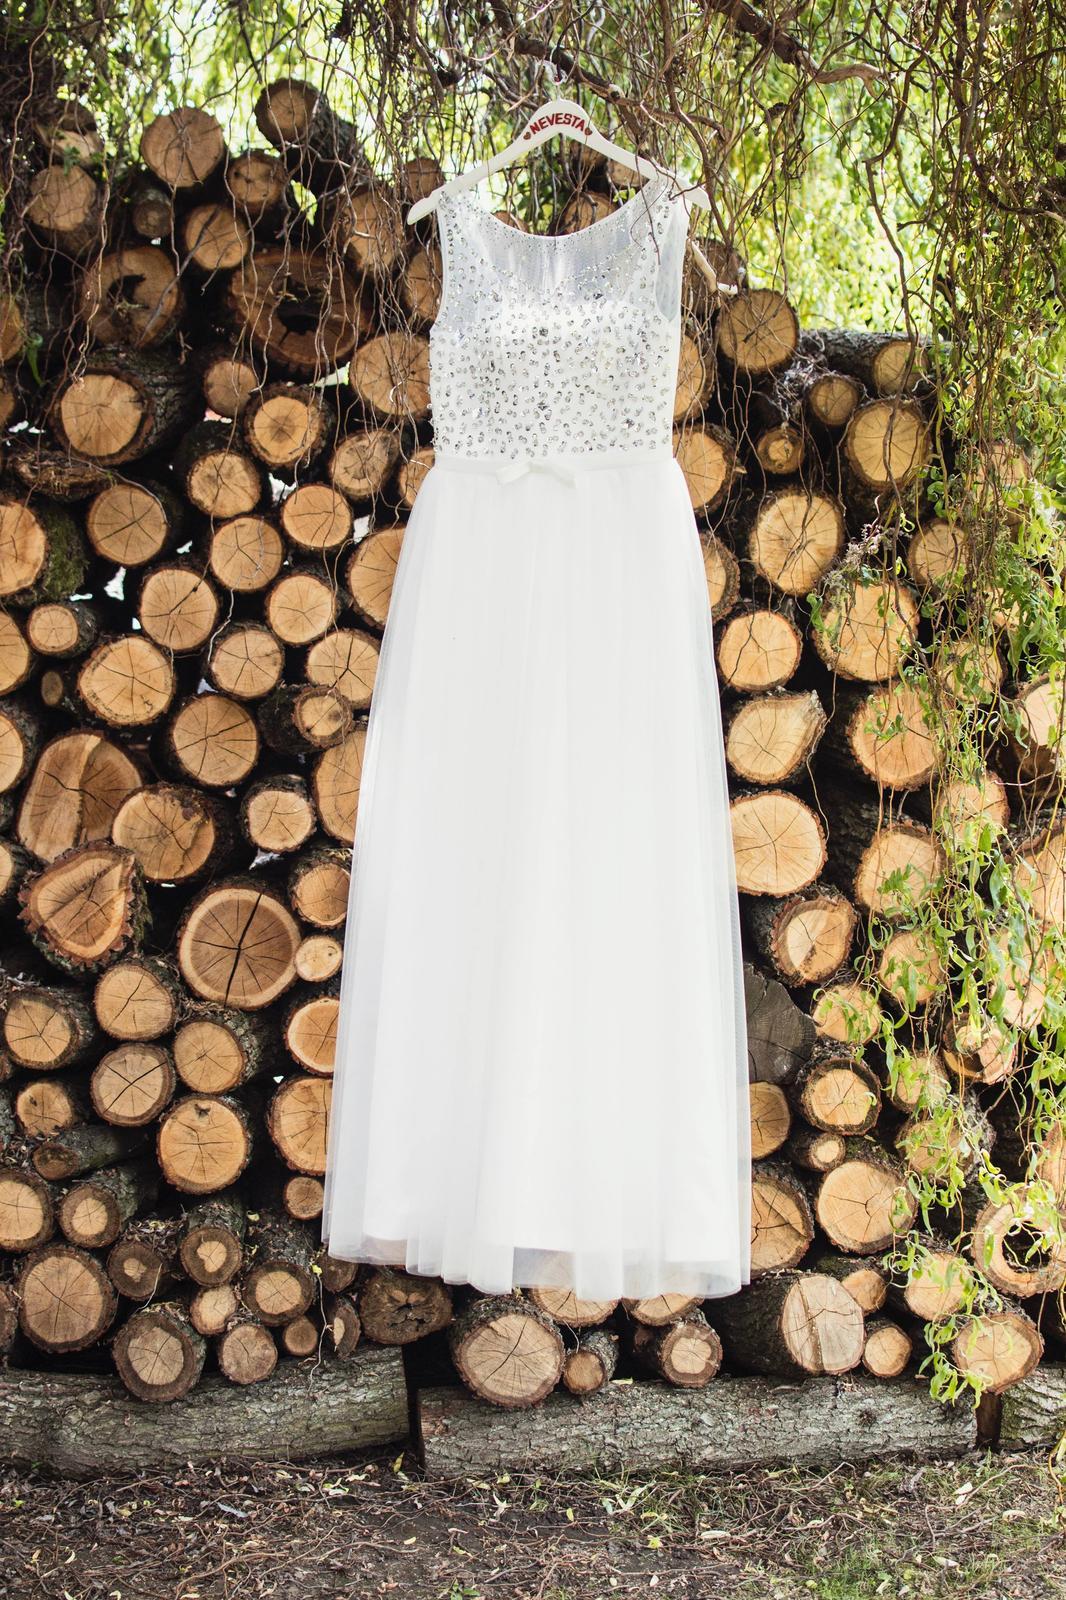 Svadobné šaty+bolerko+obal na šaty+vešiak nevesta - Obrázok č. 1